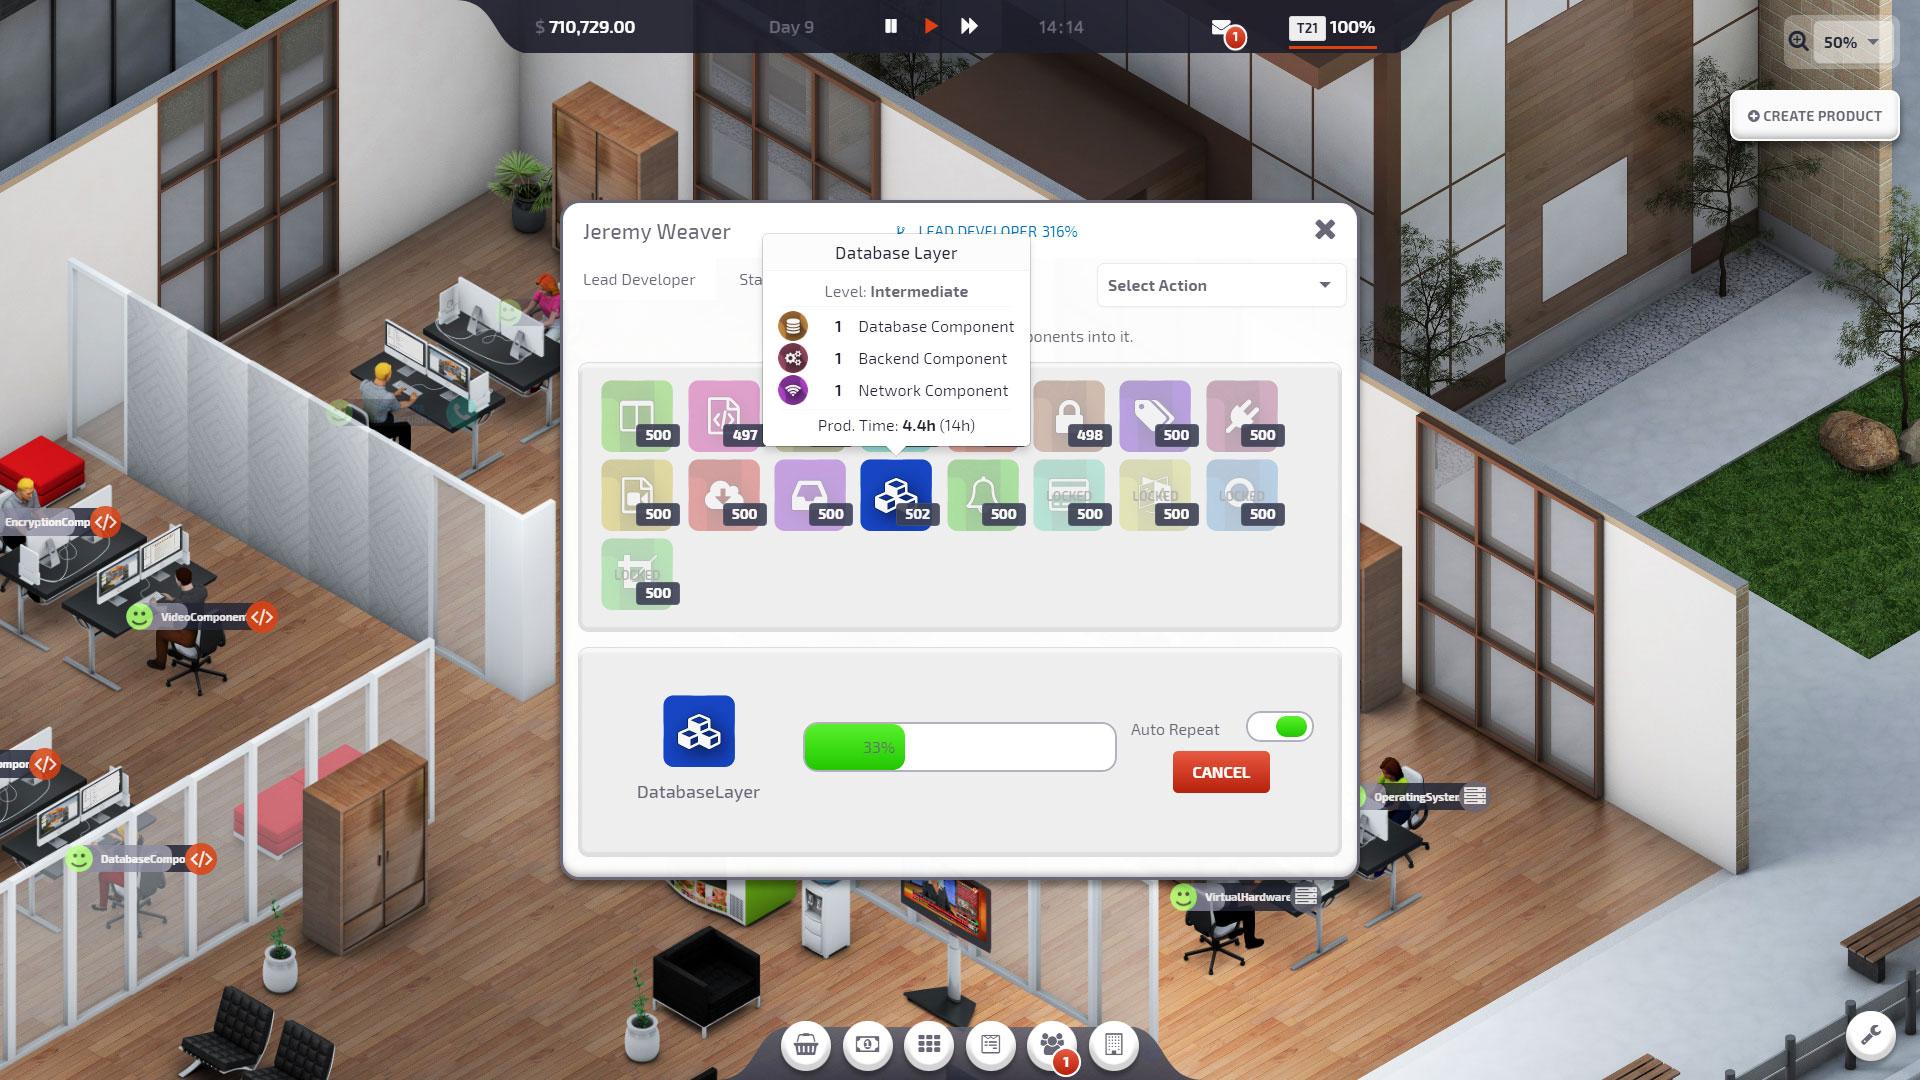 Startup Company Screenshot 2